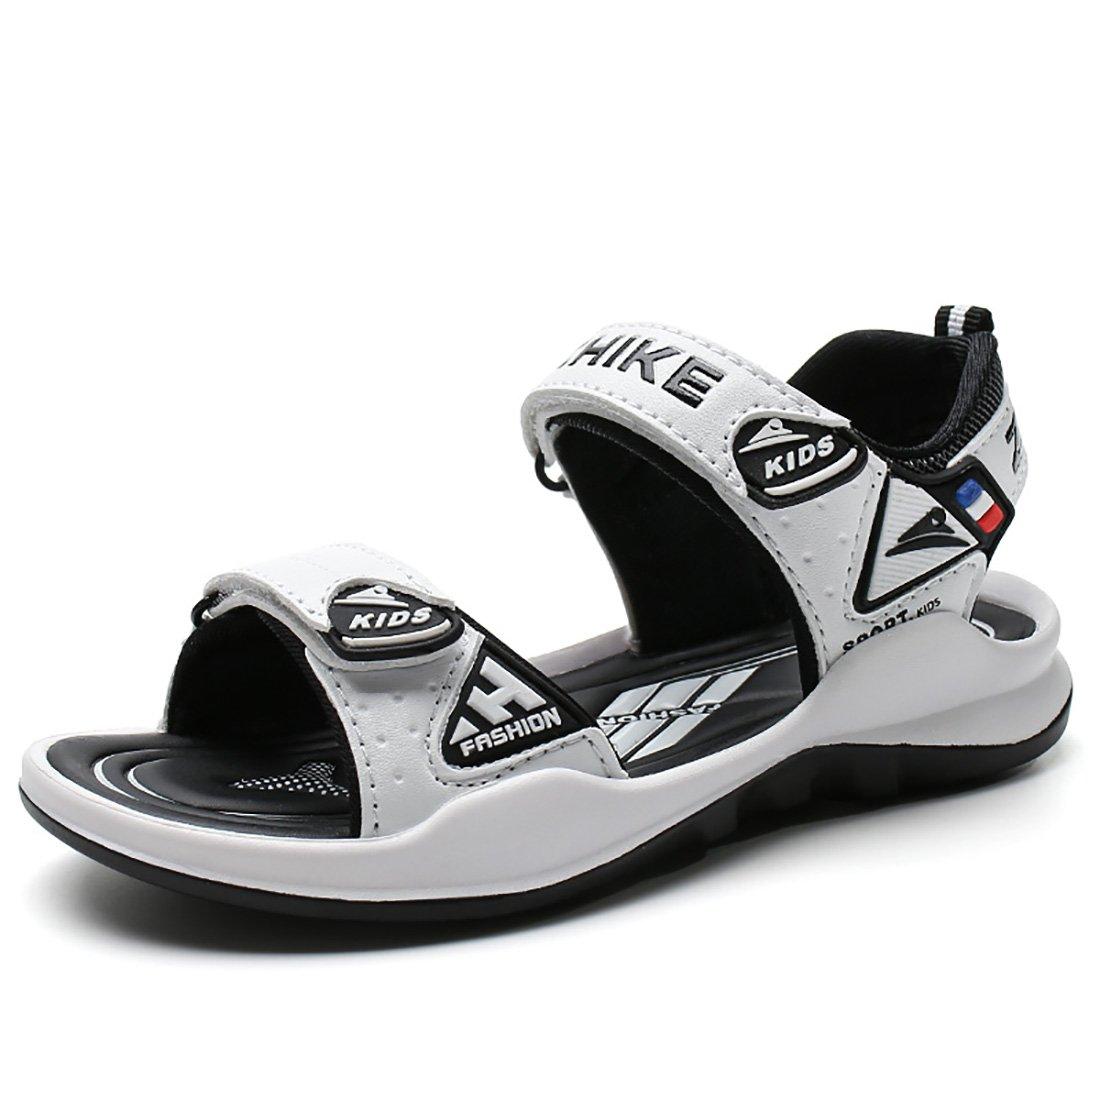 EZUOGO Boys Sandals Kids Athletic Outdoor Sandals Fashion Summer Shoes